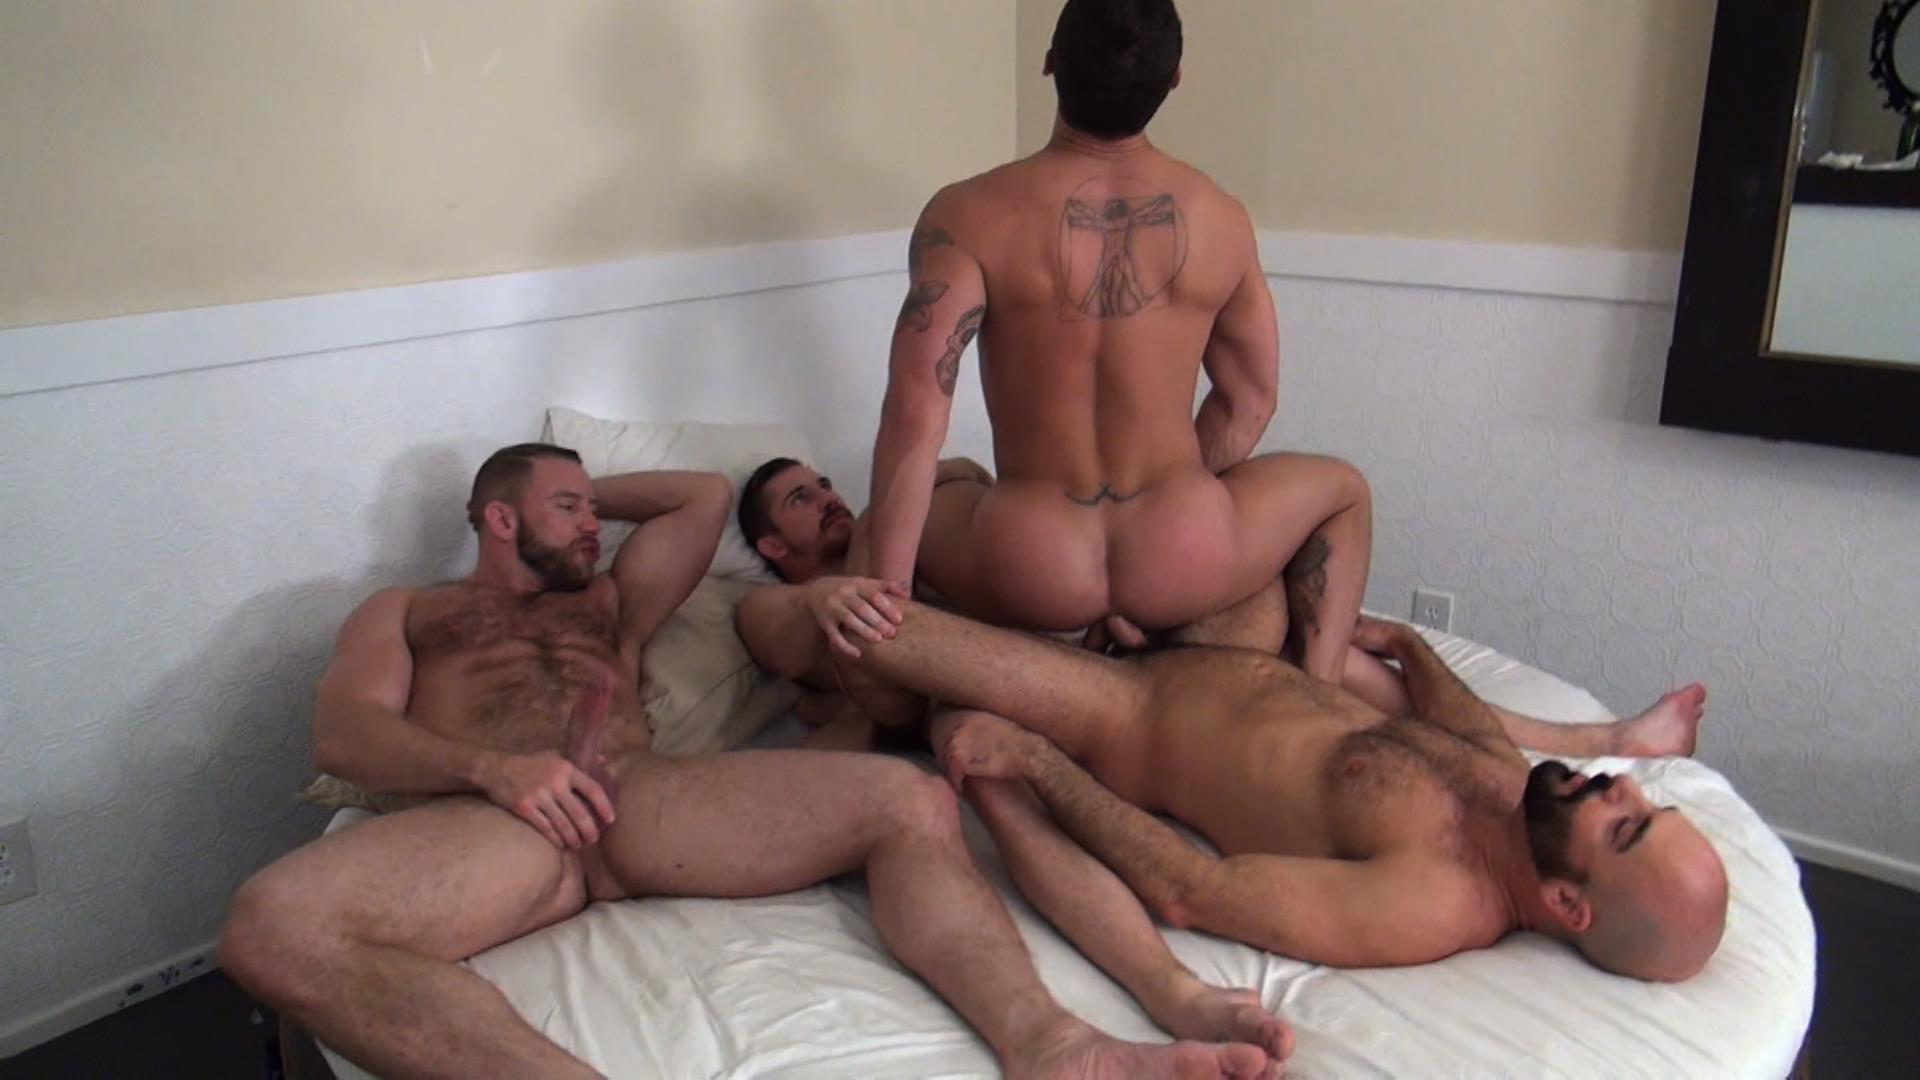 Raw-Fuck-Club-Dayton-OConnor-Tate-Ryder-Shay-Michaels-Adam-Russo-Bareback-Breeding-Amateur-Gay-Porn-1 Tate Ryder Gets Three Hairy Muscle Daddy Bareback Cocks